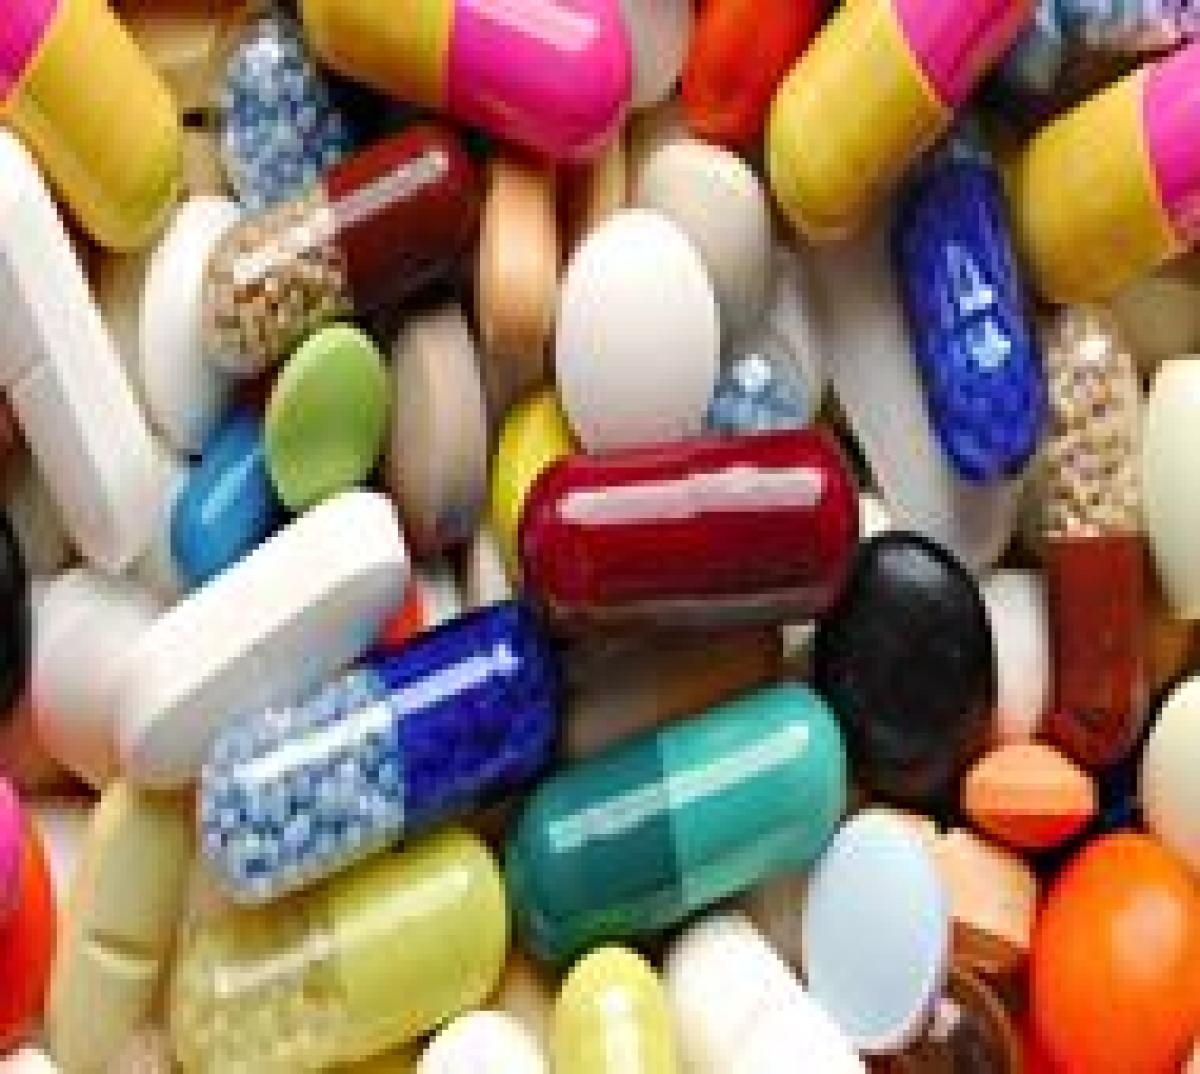 Antibiotics may boost harmful gut bacteria